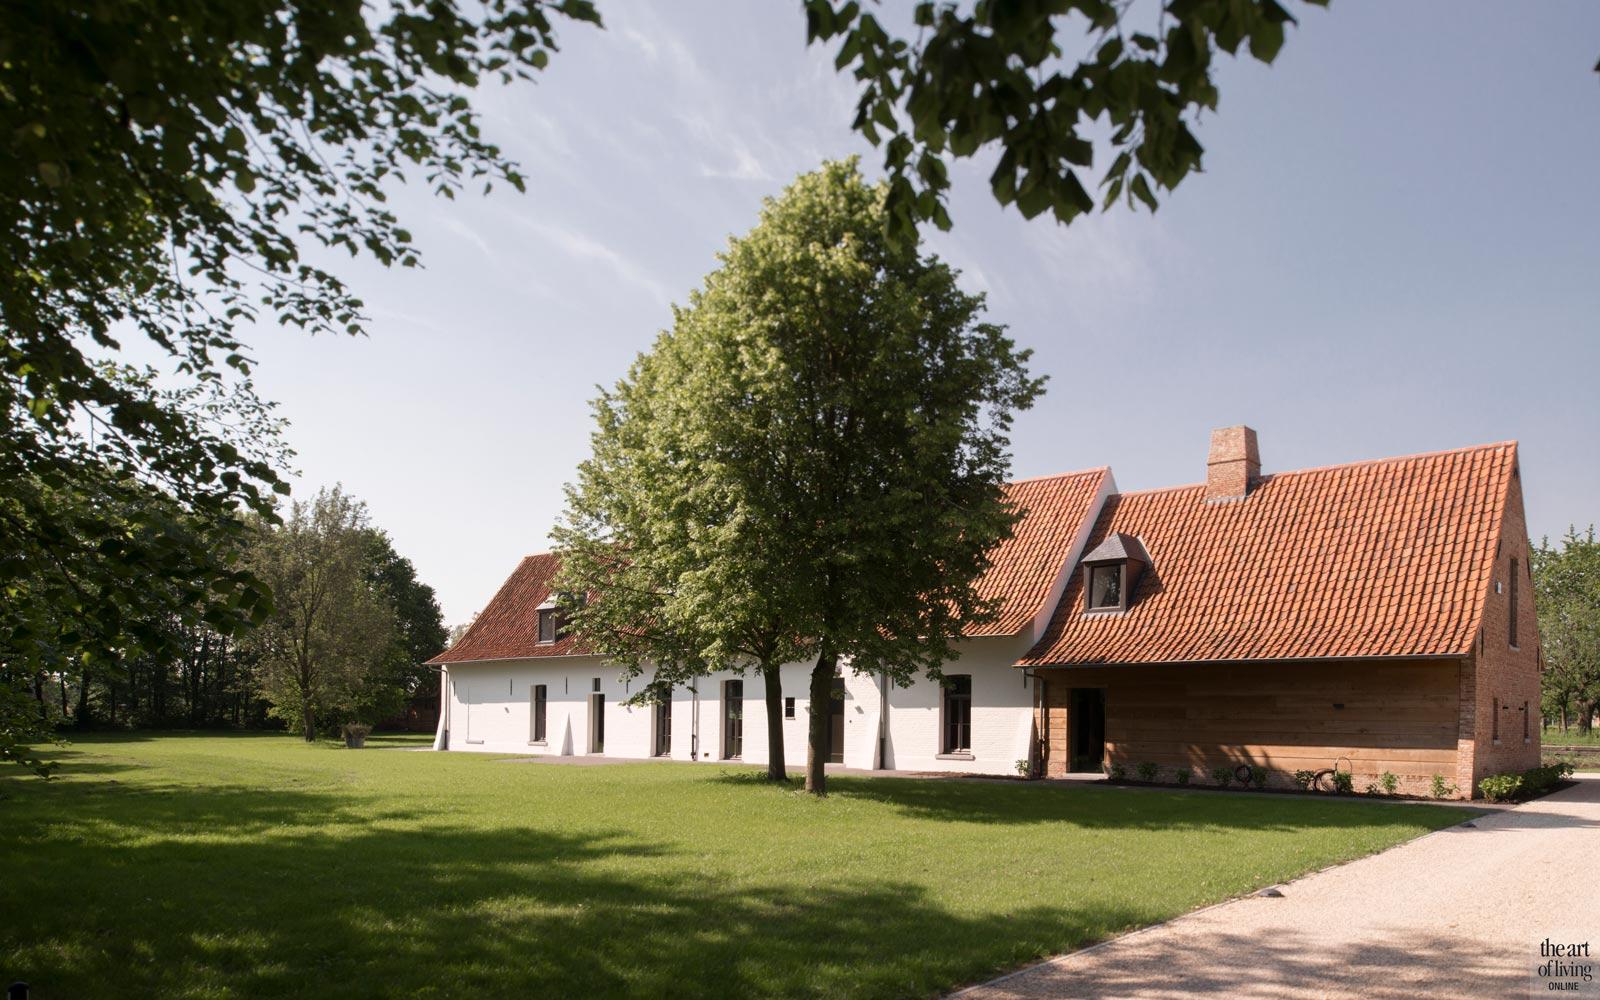 villa, the art of living, hoeve groende omgeving, Glenn Reynaert, top 5 klassieke villa's